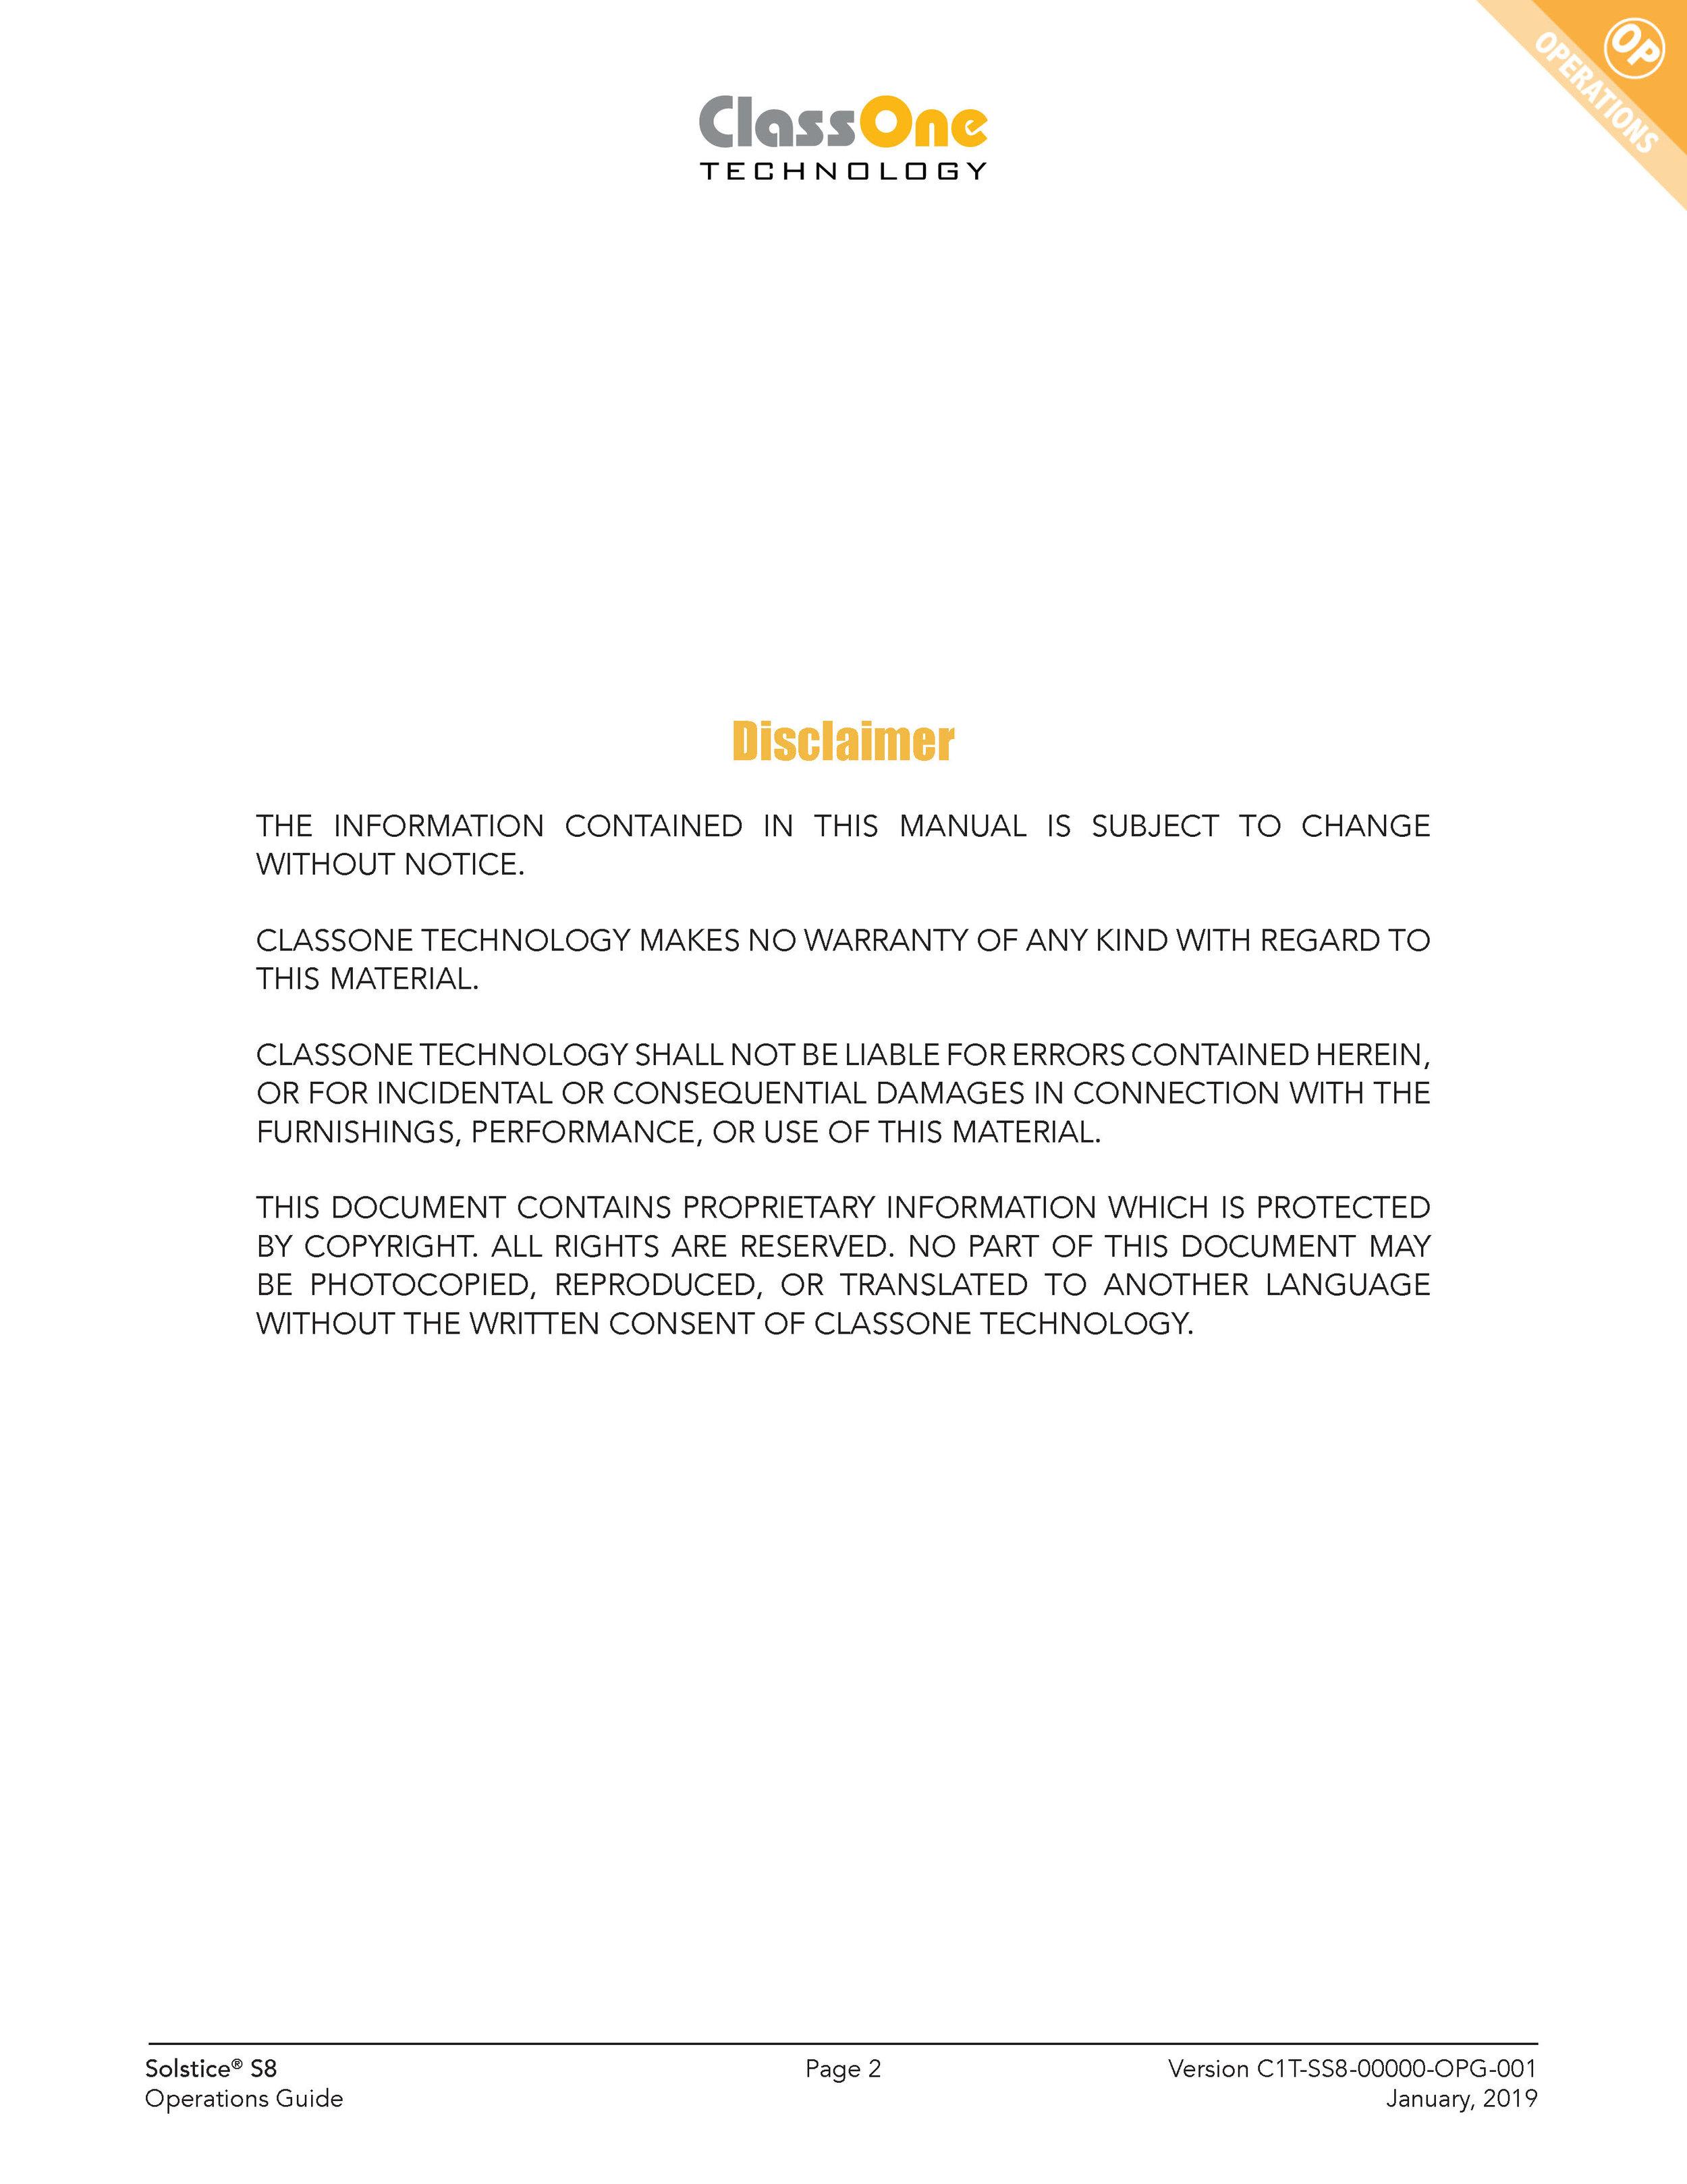 19-01-18 C1T-SS8-00000-OPG-001_Page_002.jpg